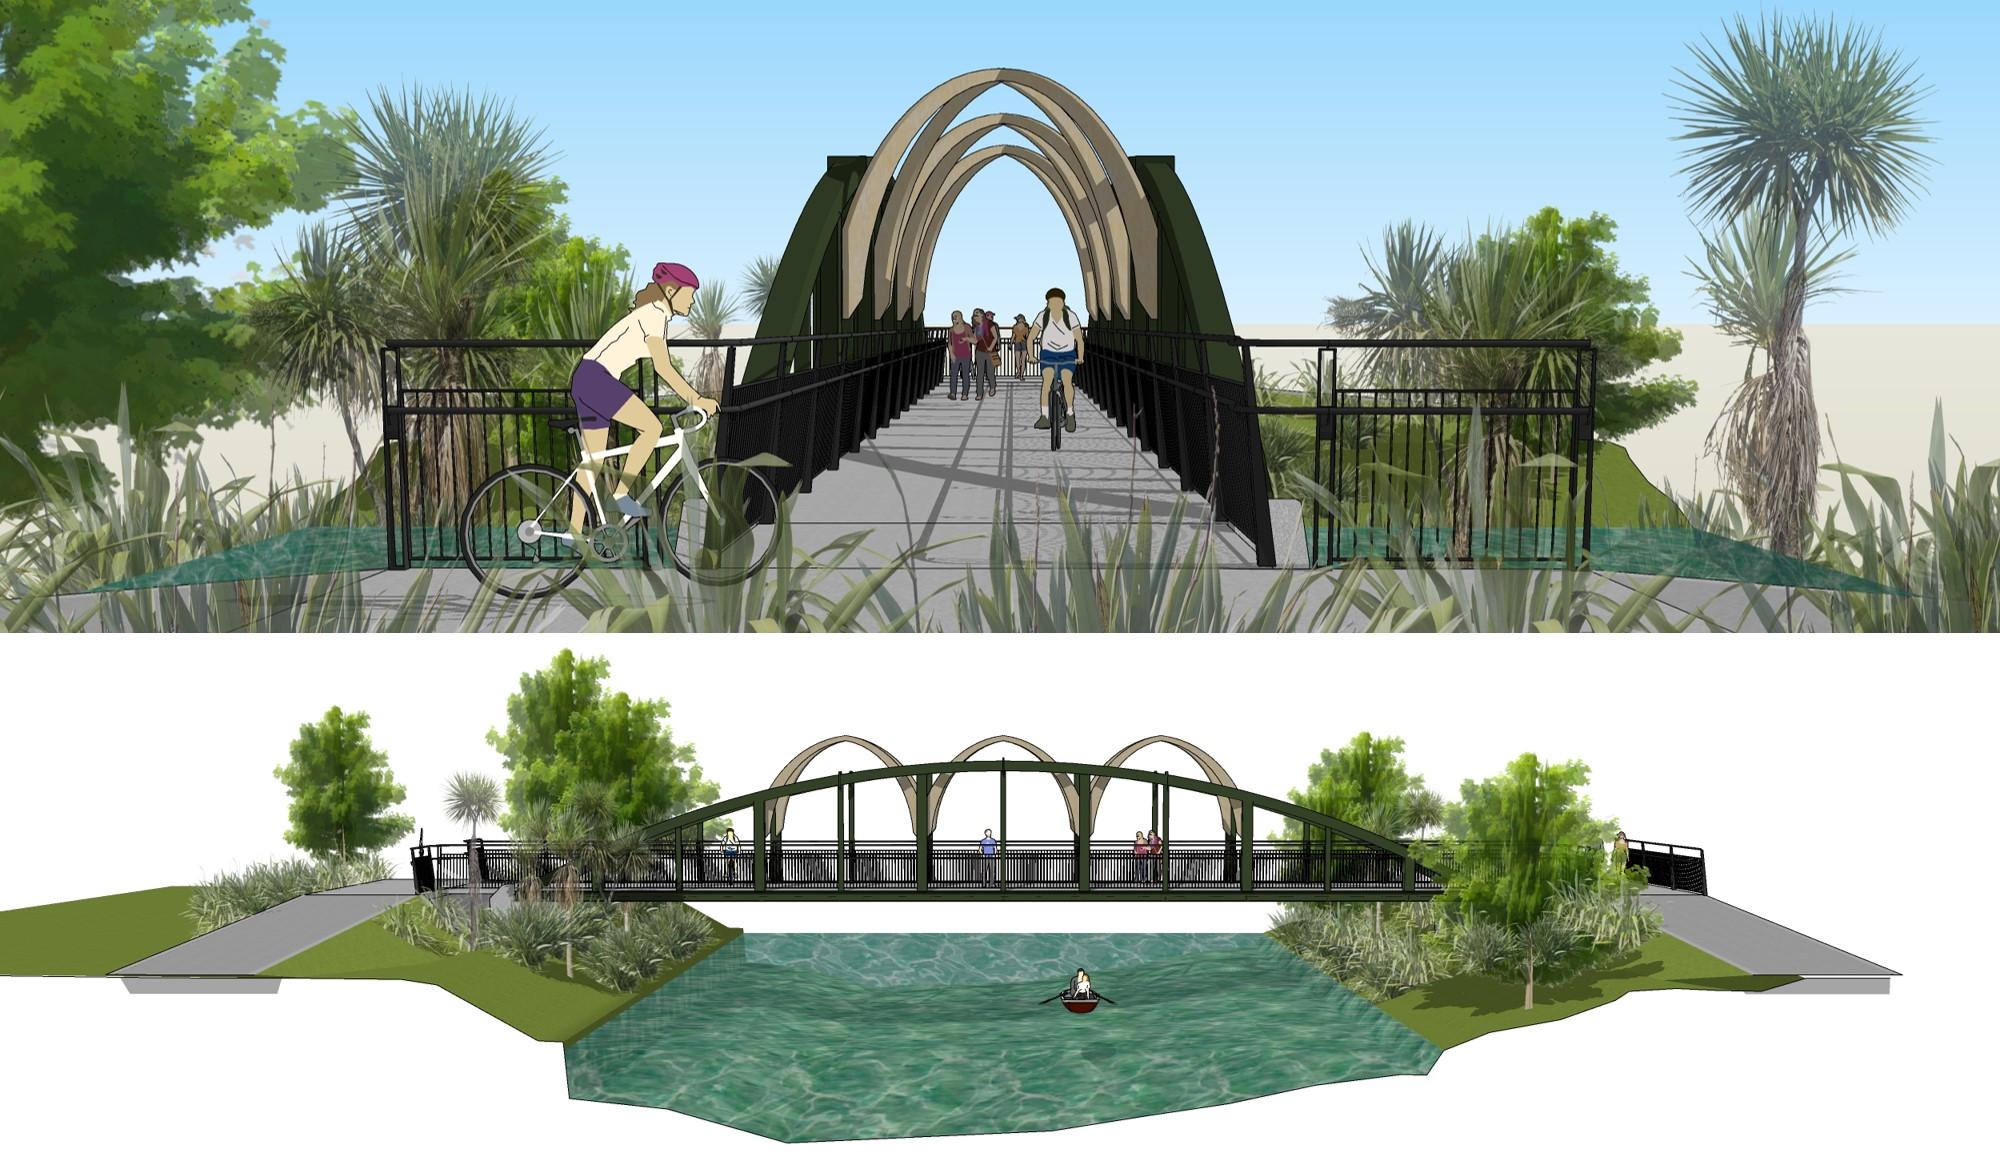 'Snell Bridge concept 2